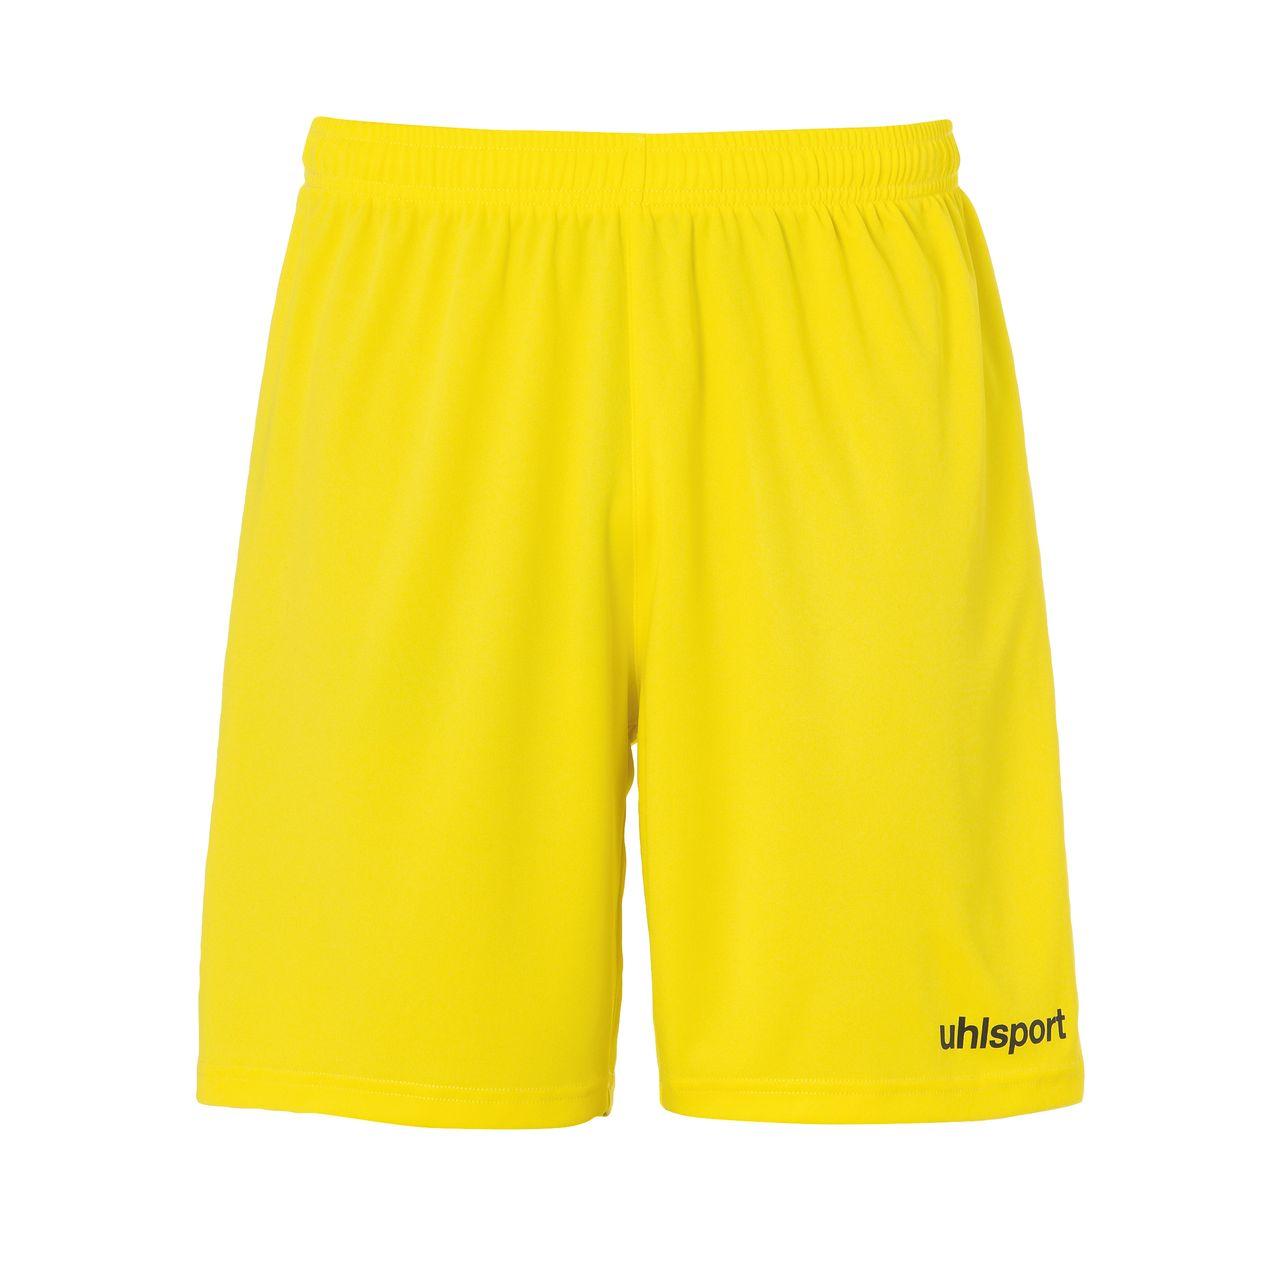 Uhlsport CENTER BASIC kurze Hose ohne Innenslip